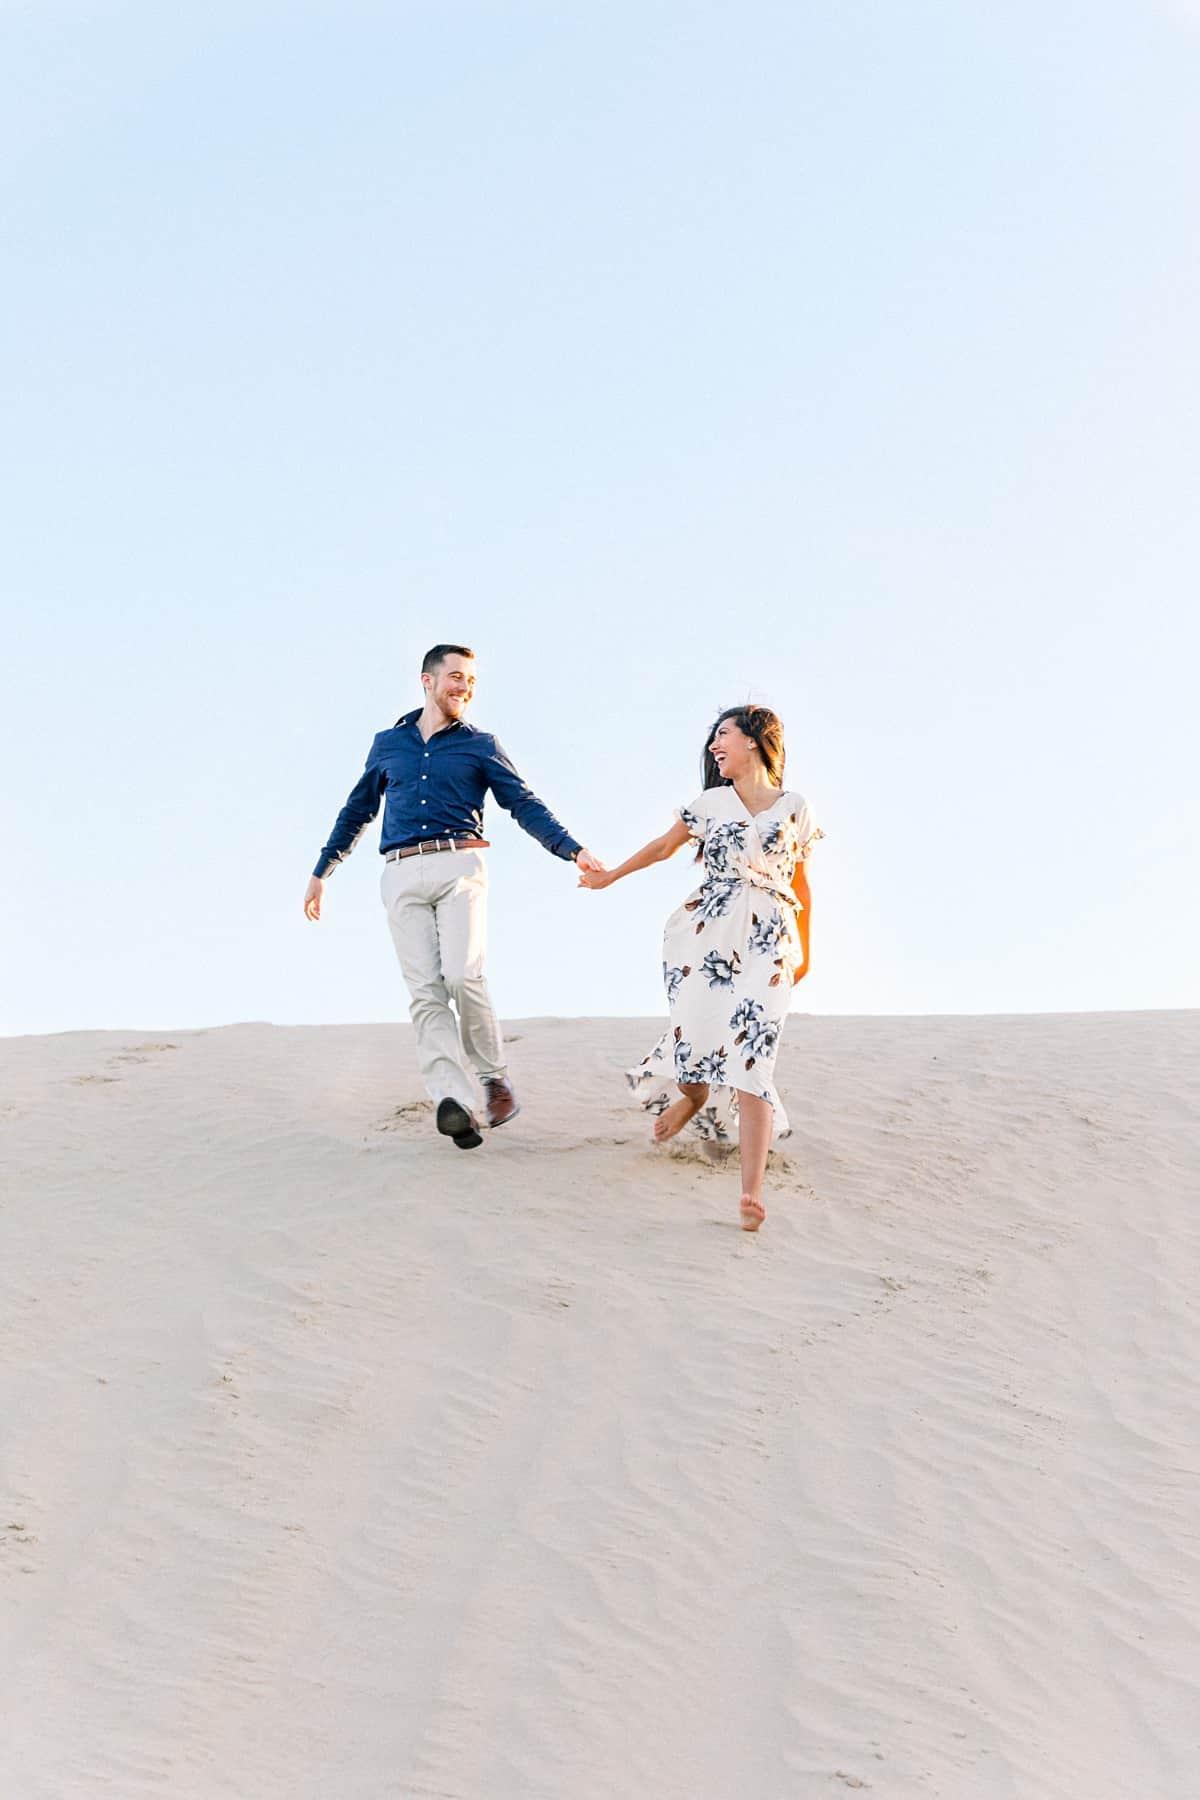 Sand Dunes Desert Engagement Photos, adventure photography